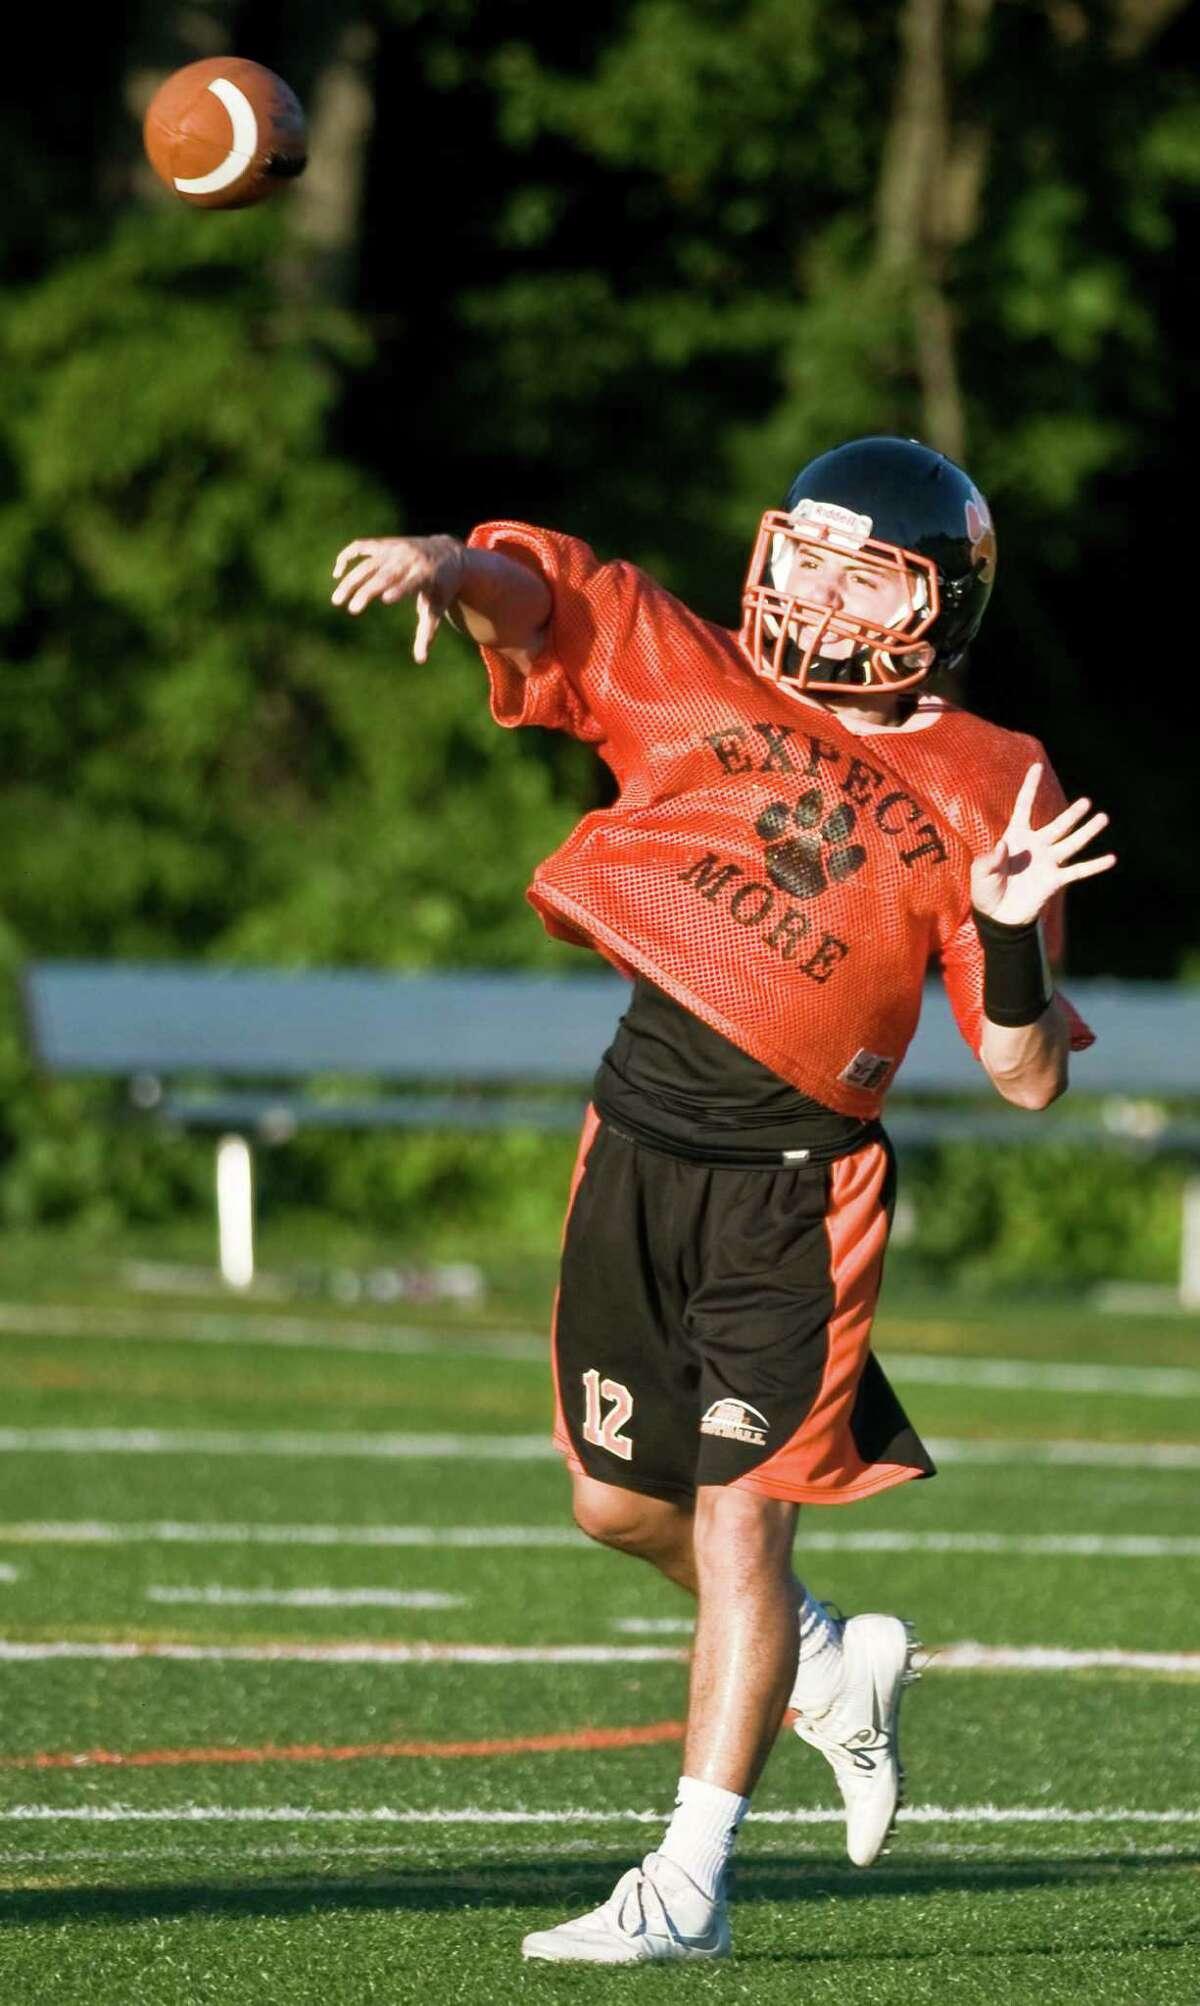 Quarterback Drew Fowler, a senior, firing a pass during a Ridgefield High School football practice. Friday, Aug. 19, 2016